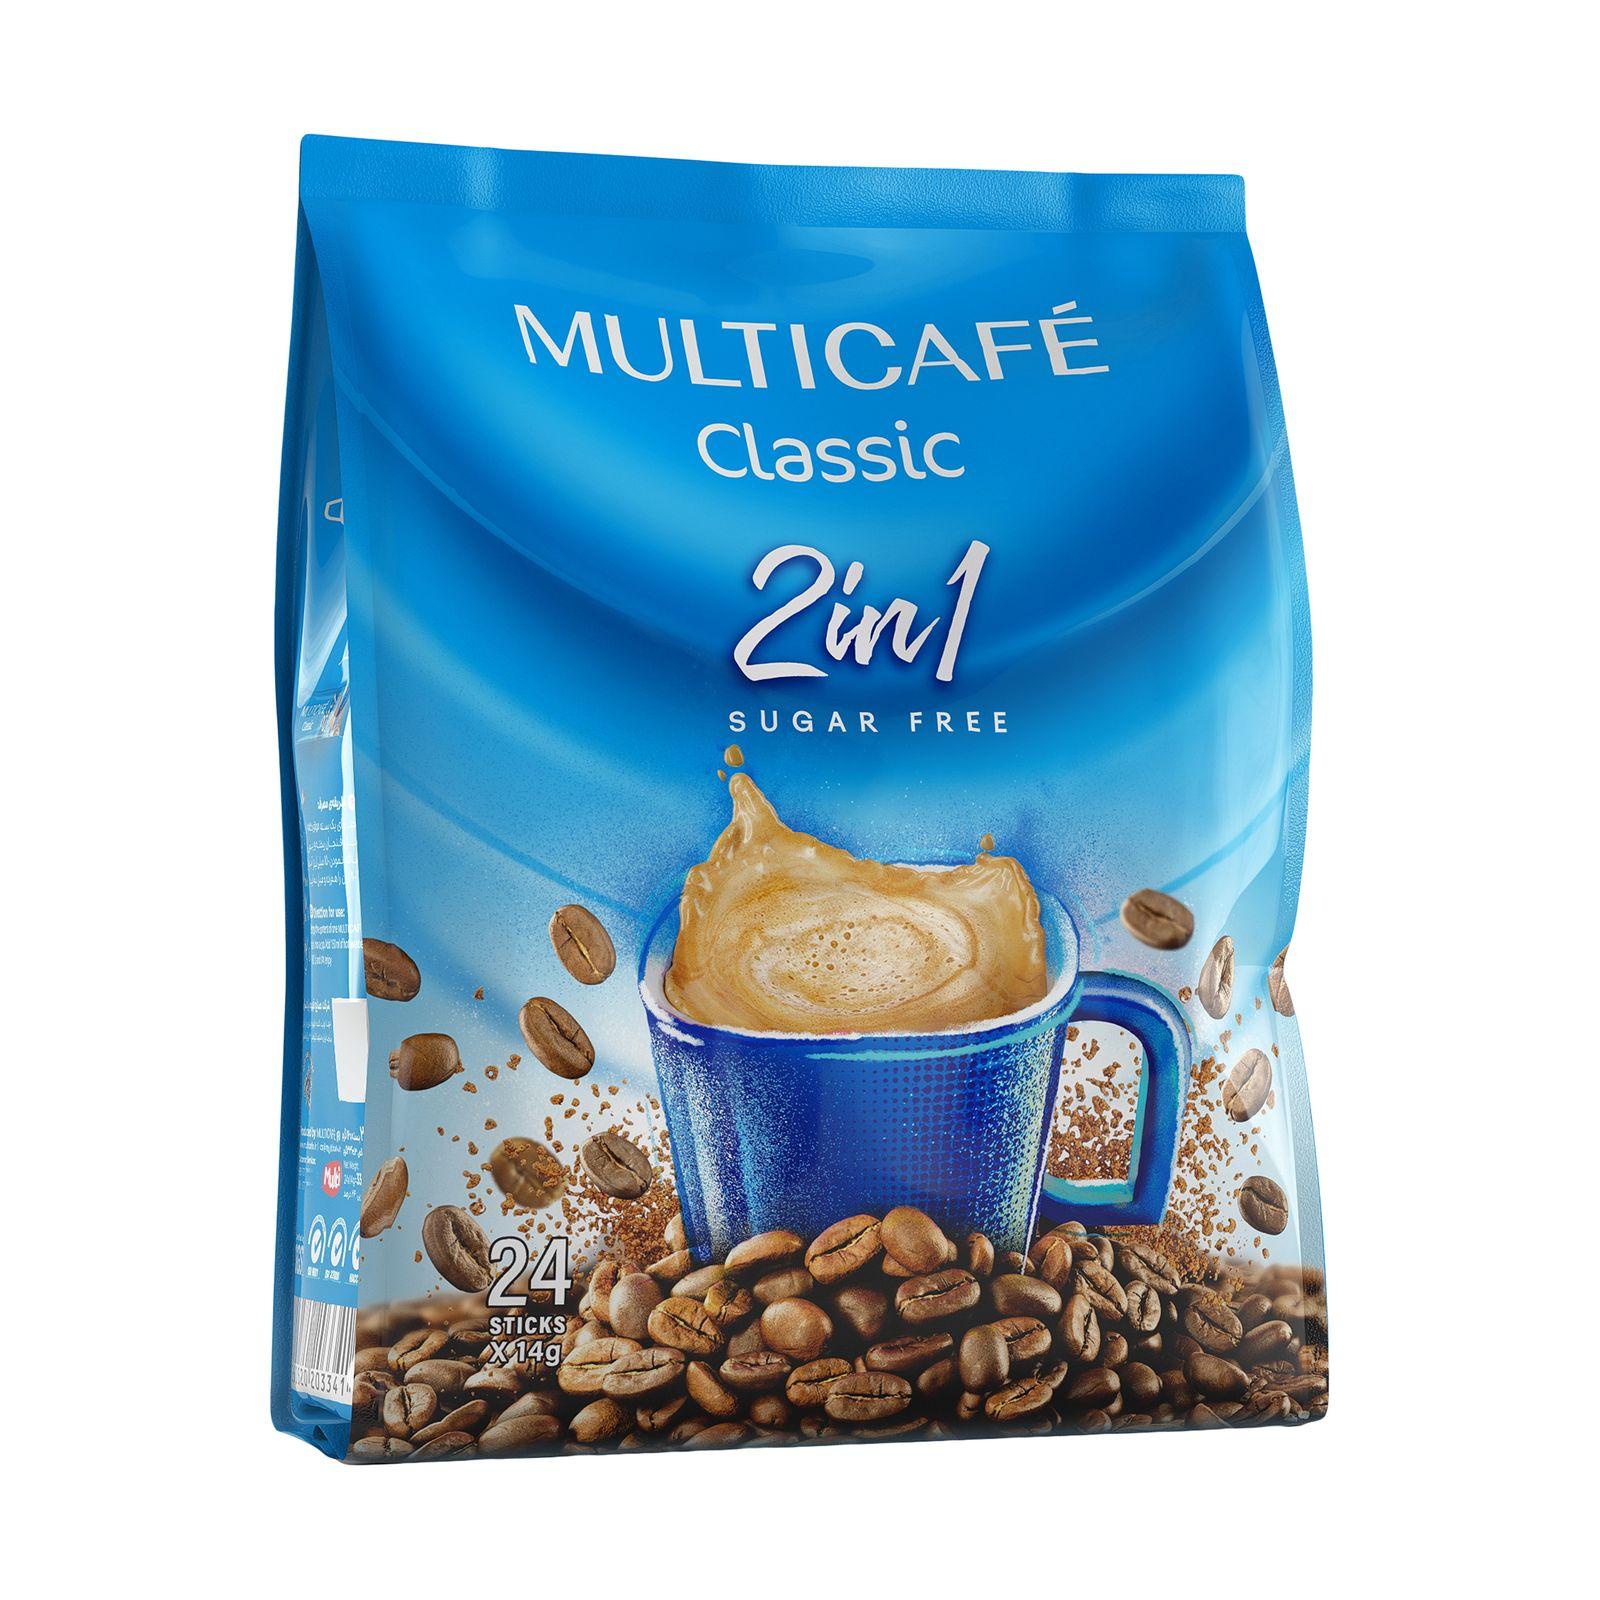 کافی میکس 1 × 2 مولتی کافه - 14 گرم بسته 24 عددی  main 1 3